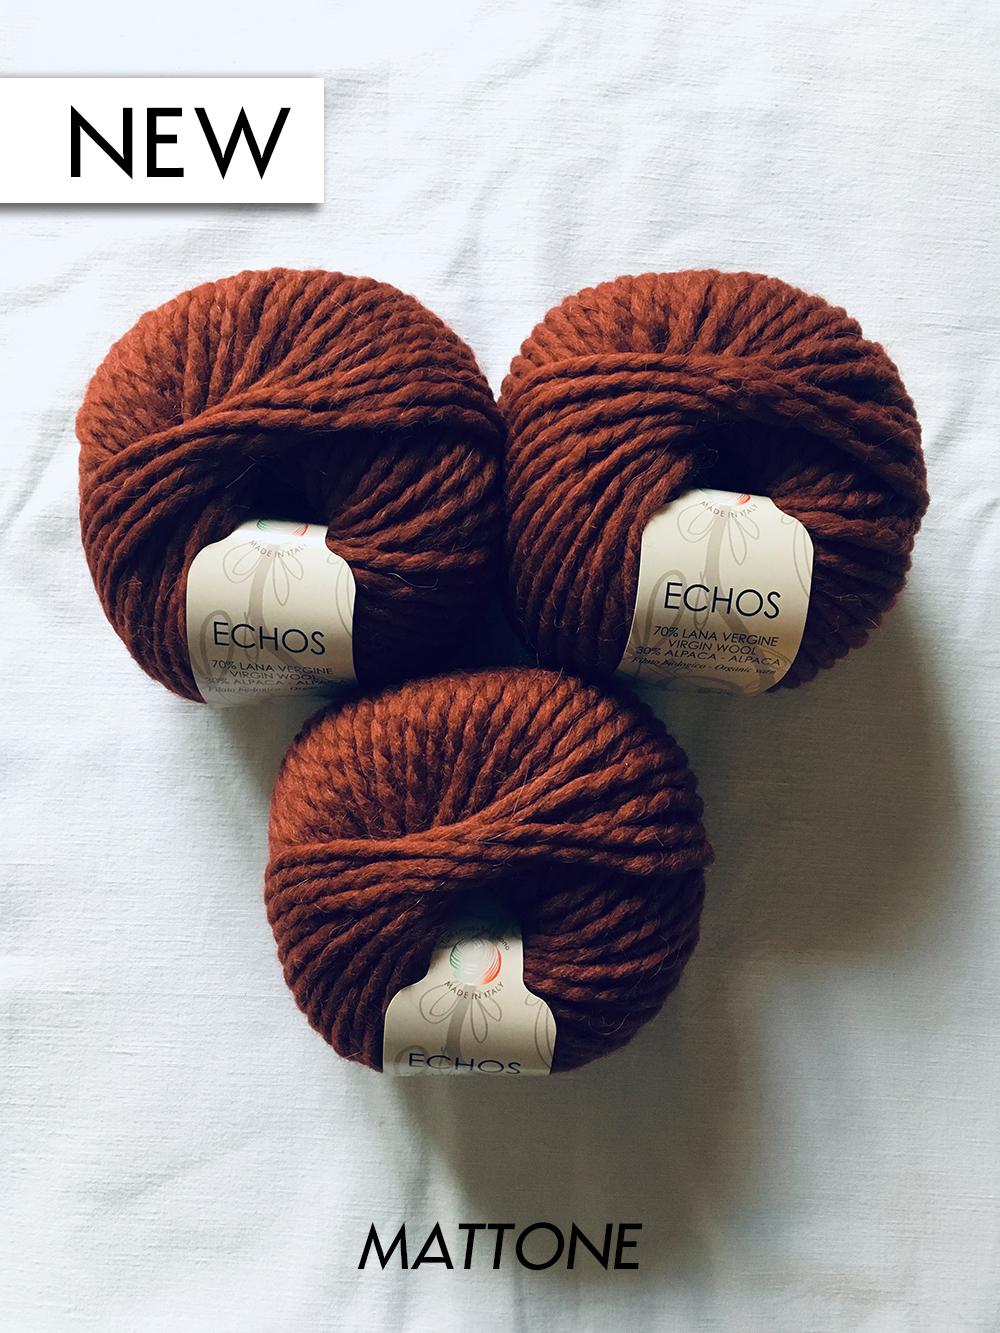 sesia_echos_mattone_3148_wool_done_knitting.jpg